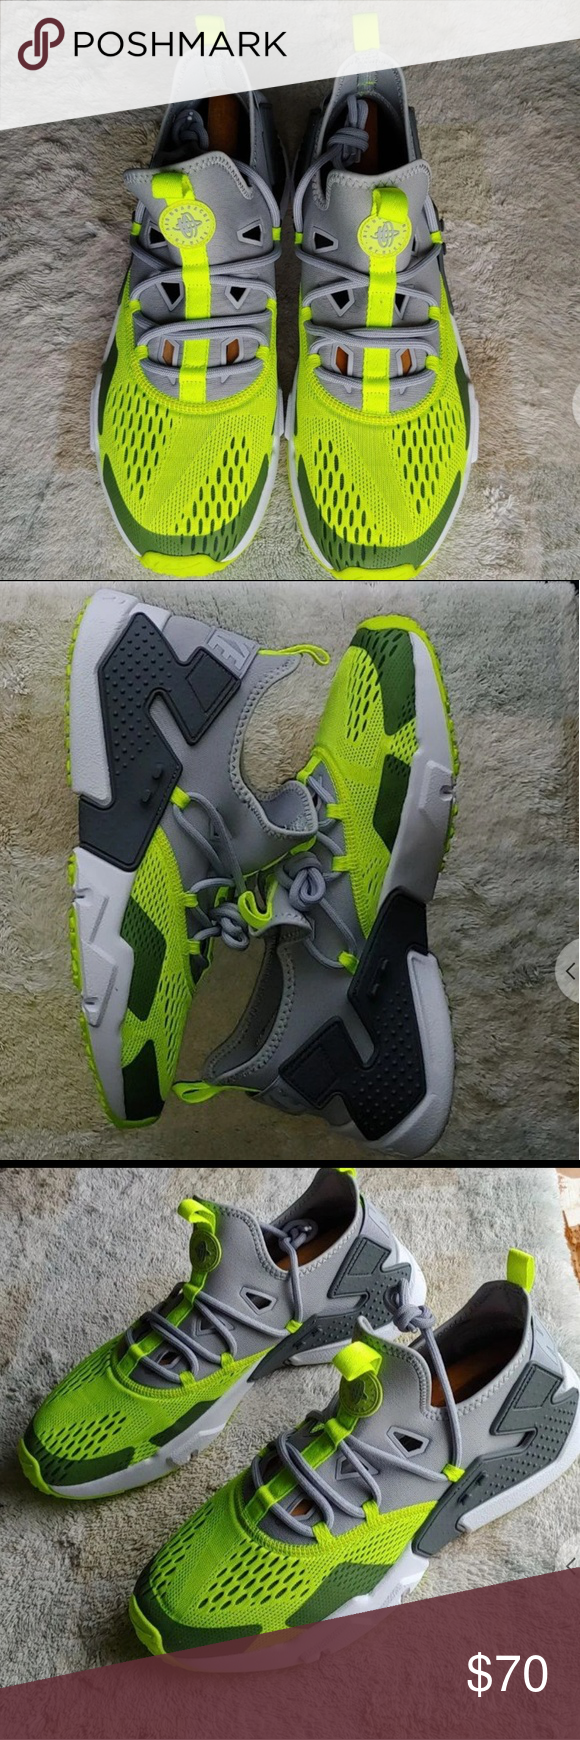 finest selection 4d09b e58aa Men s Nike Huarache drift Men s Nike Huarache drift size 11.5 brand new  without box volt green